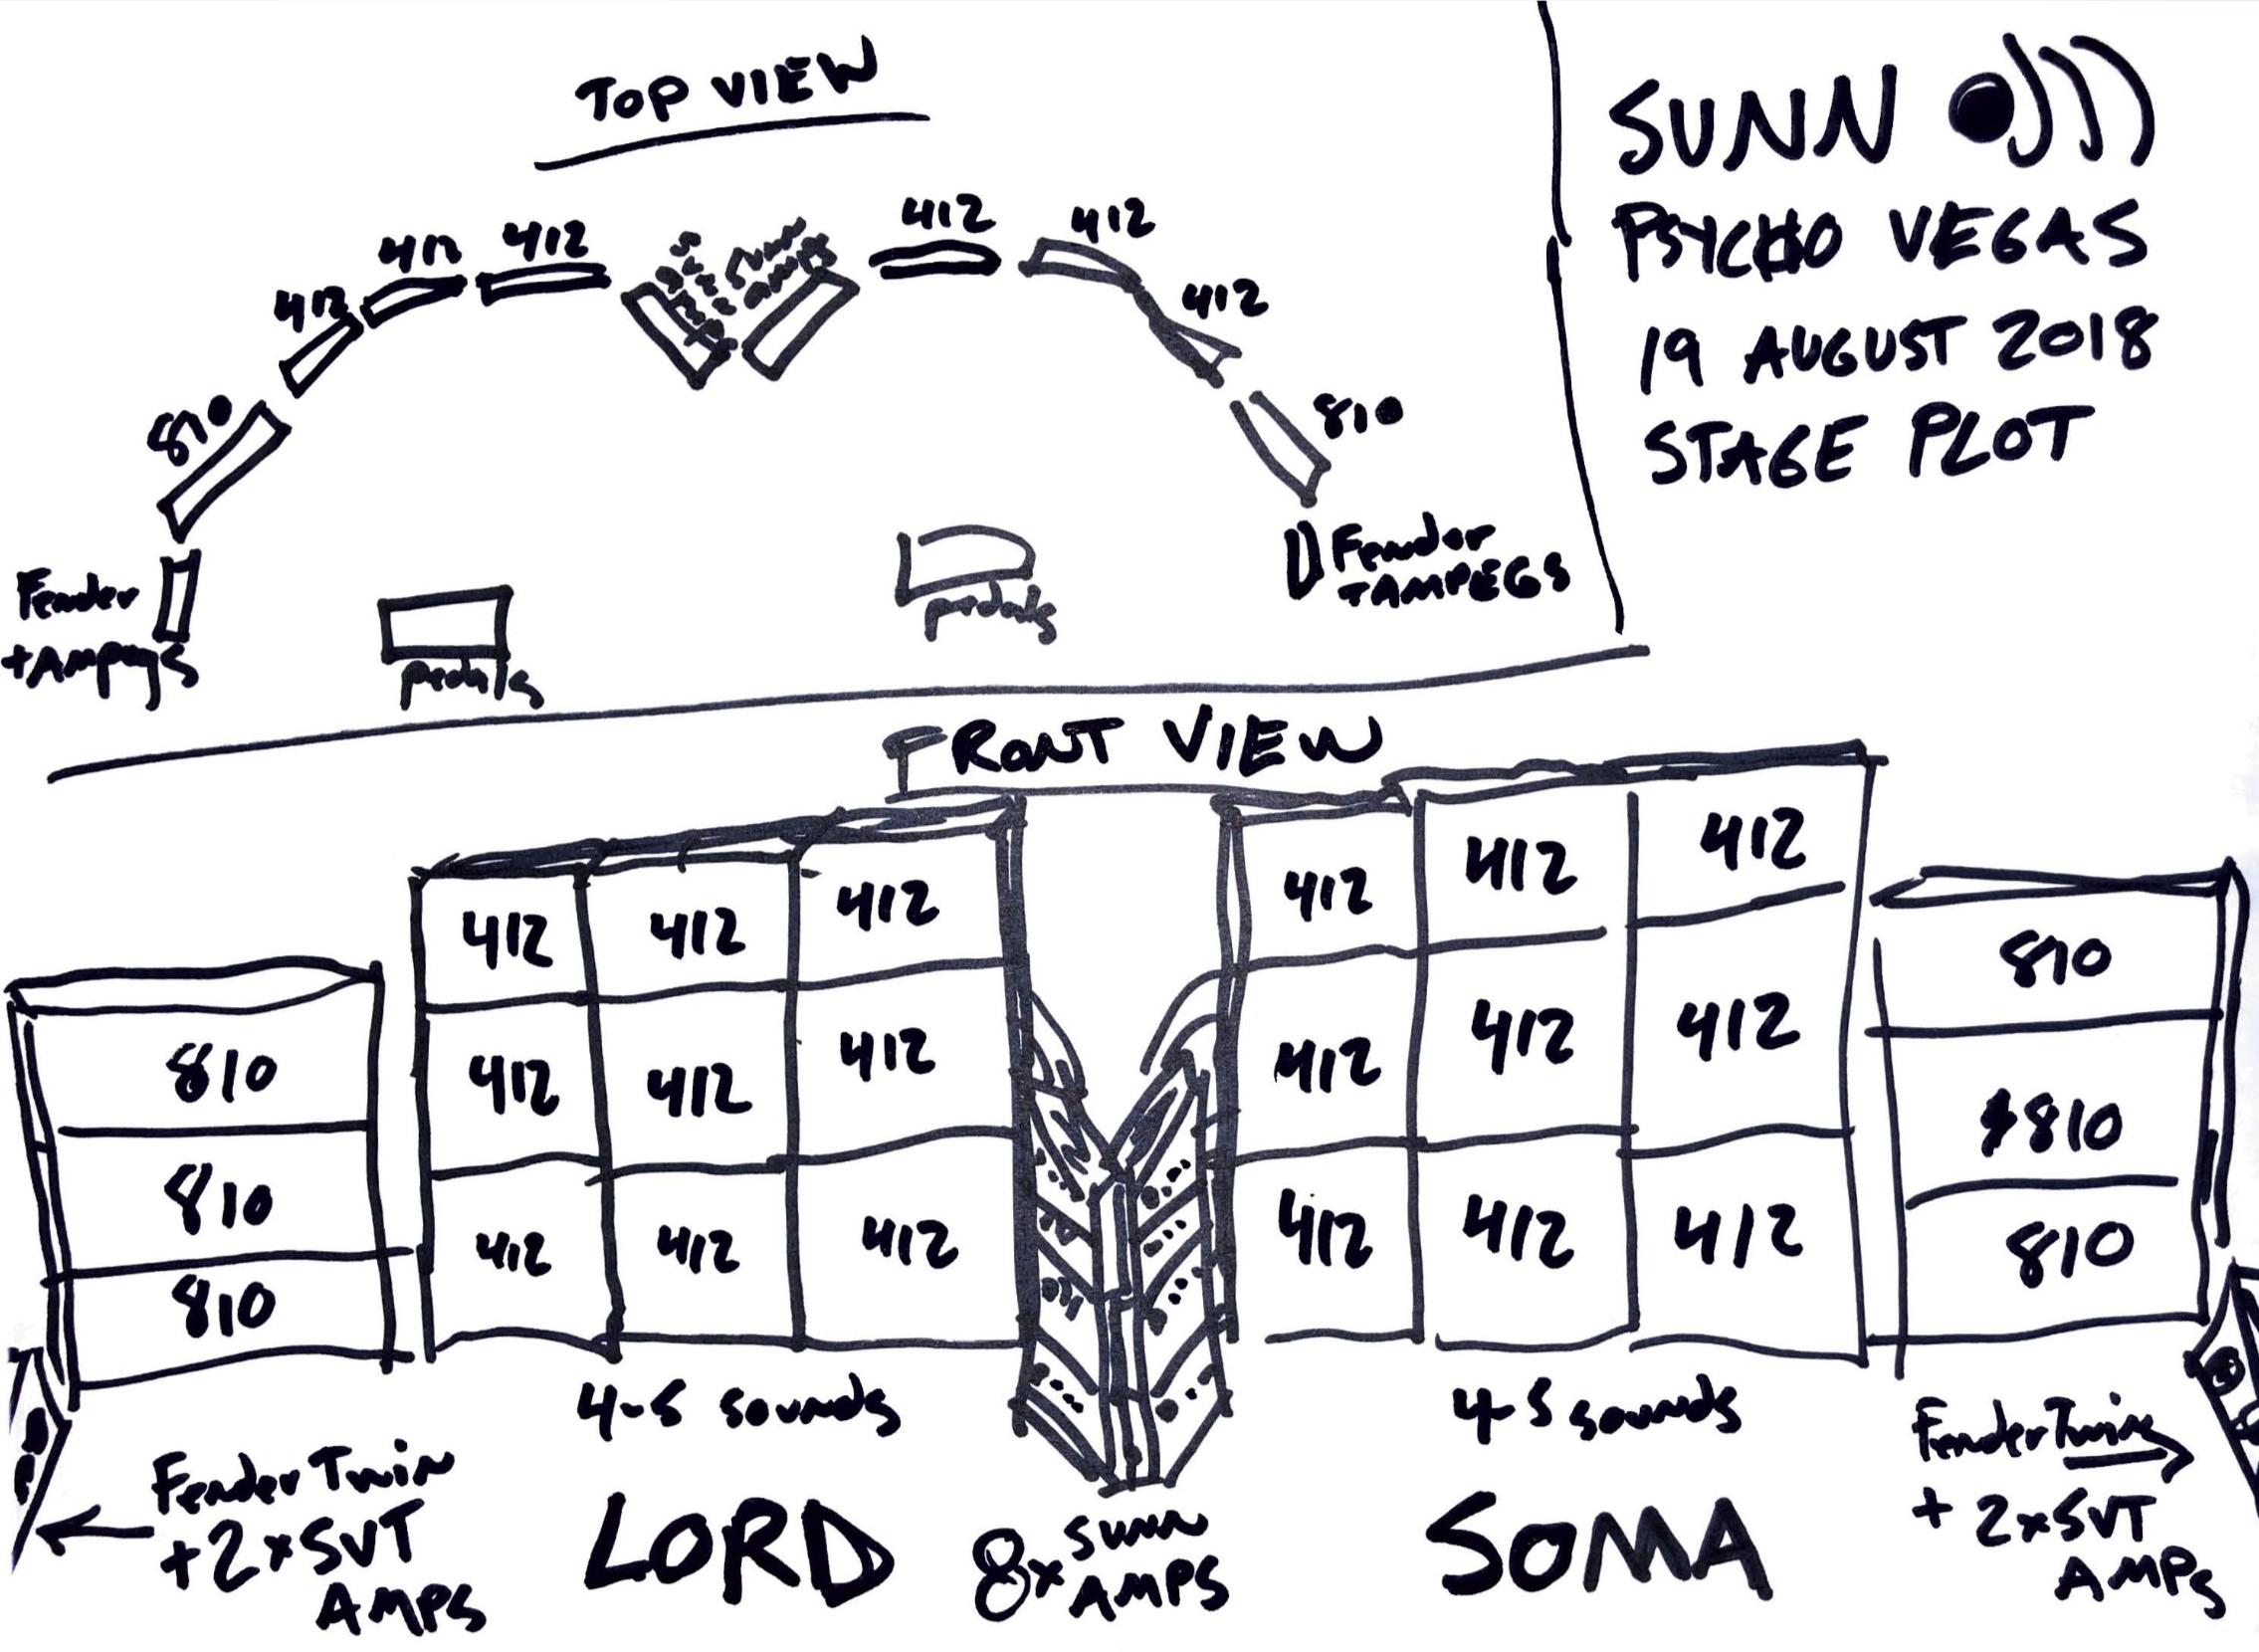 SUNN O))) Psycho Vegas stage plot 0818